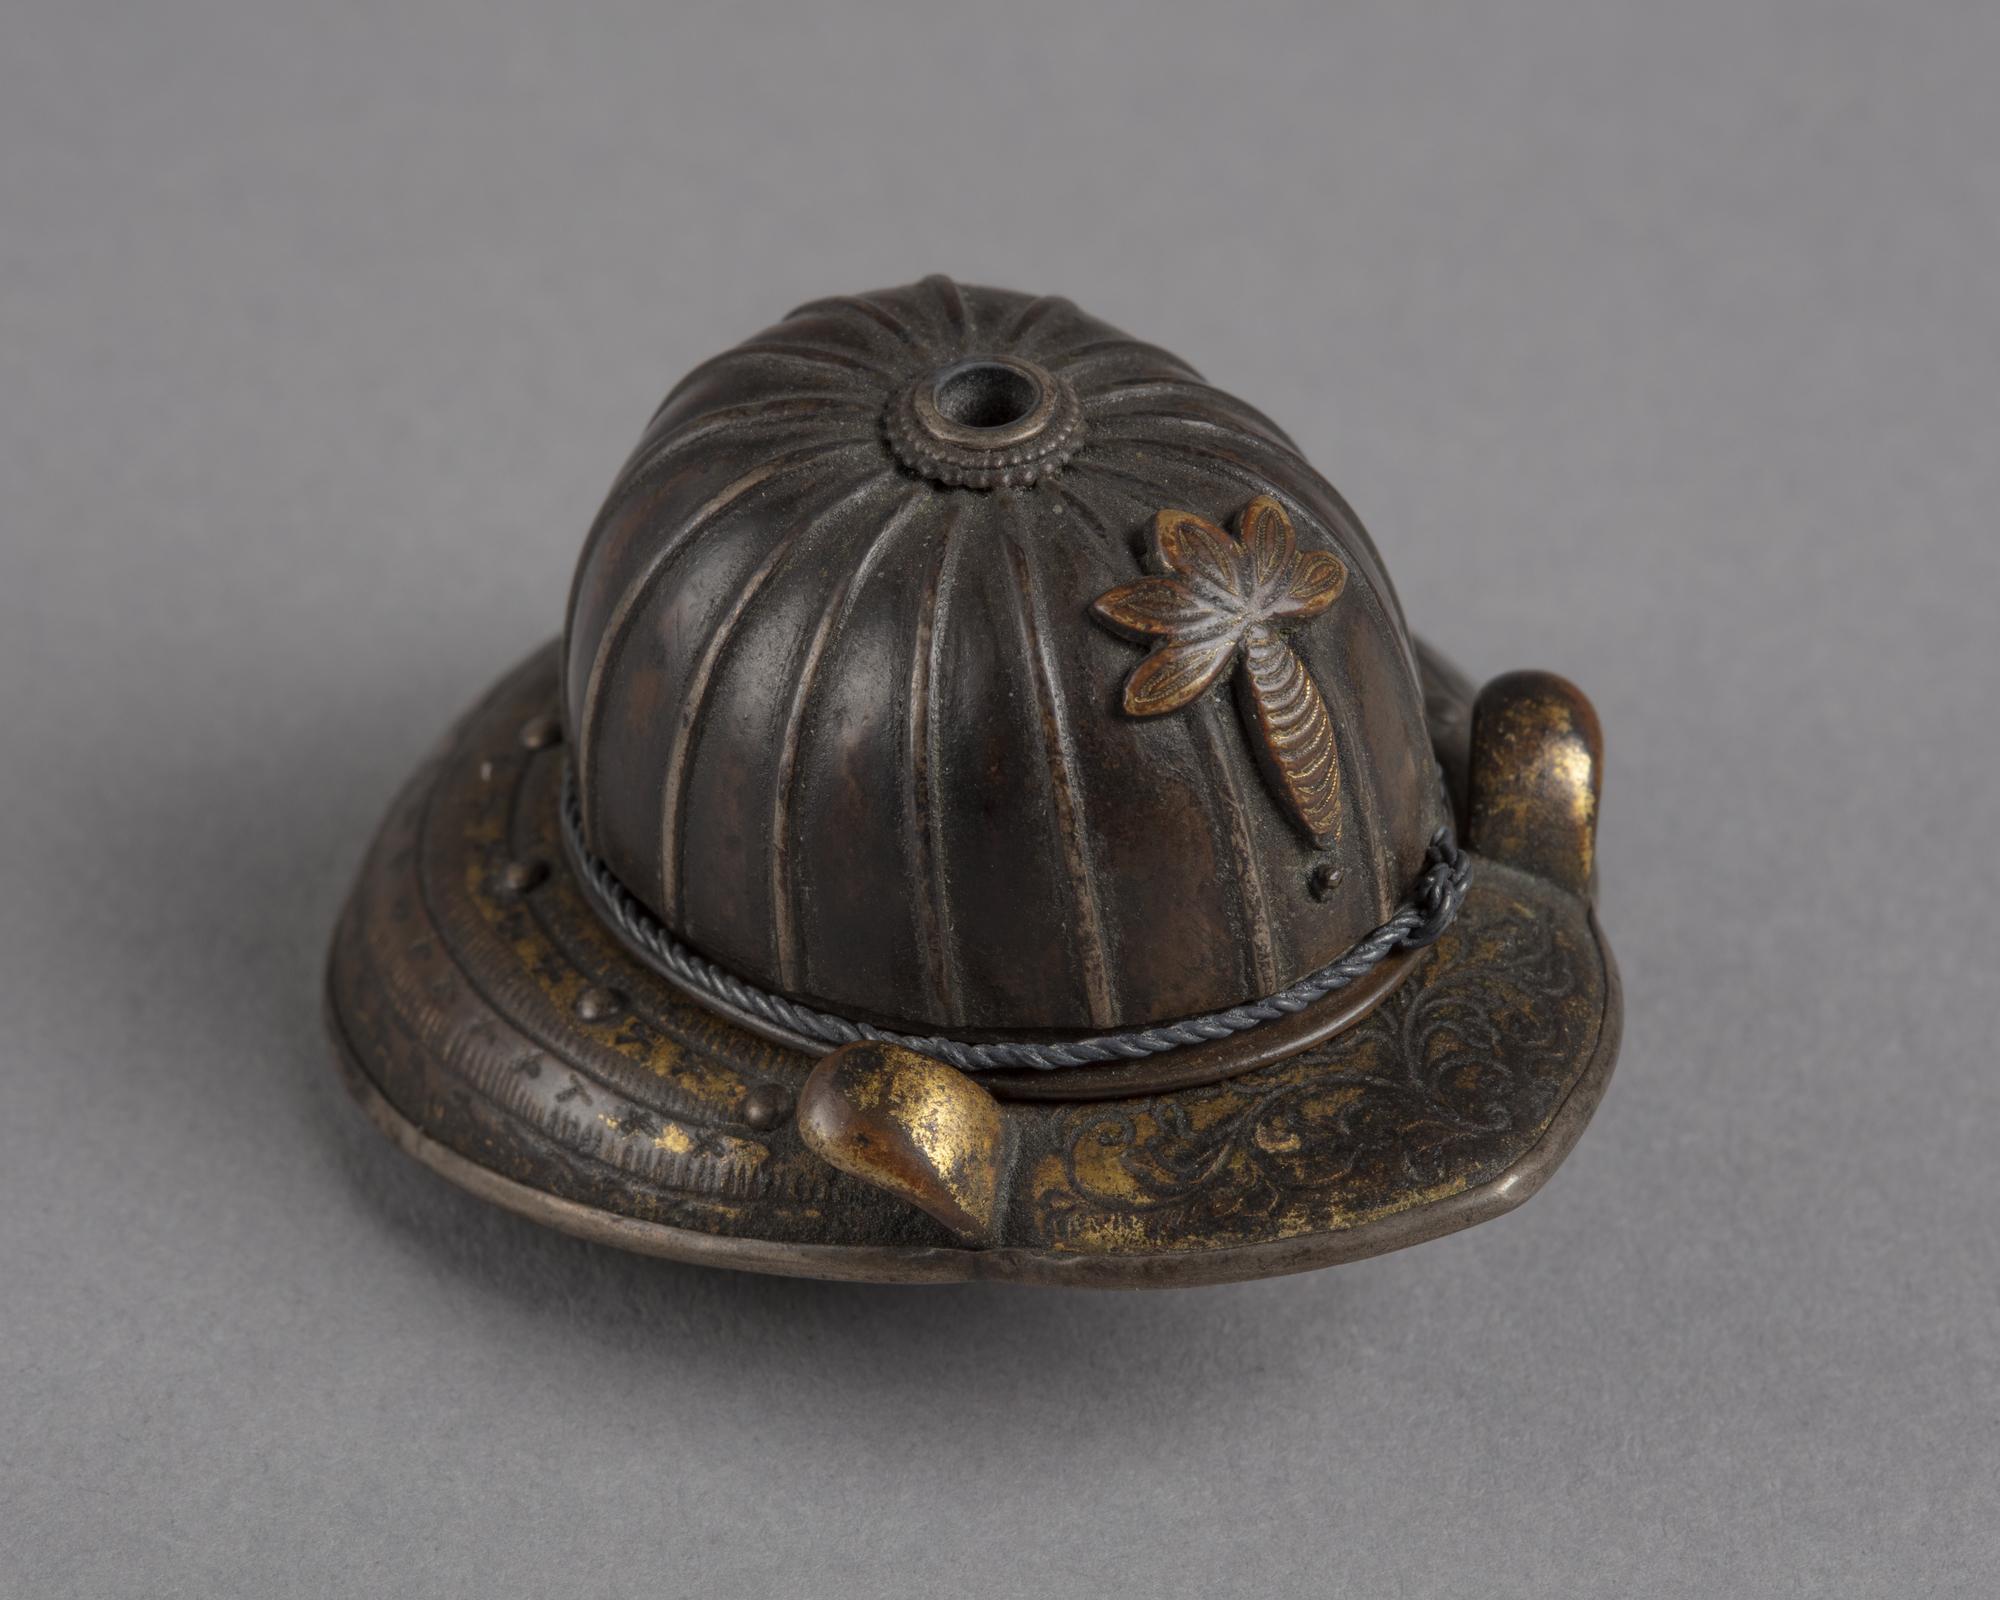 A Japanese metal netsuke of a Kabuto, a metal helmet worn by samurai soldiers.